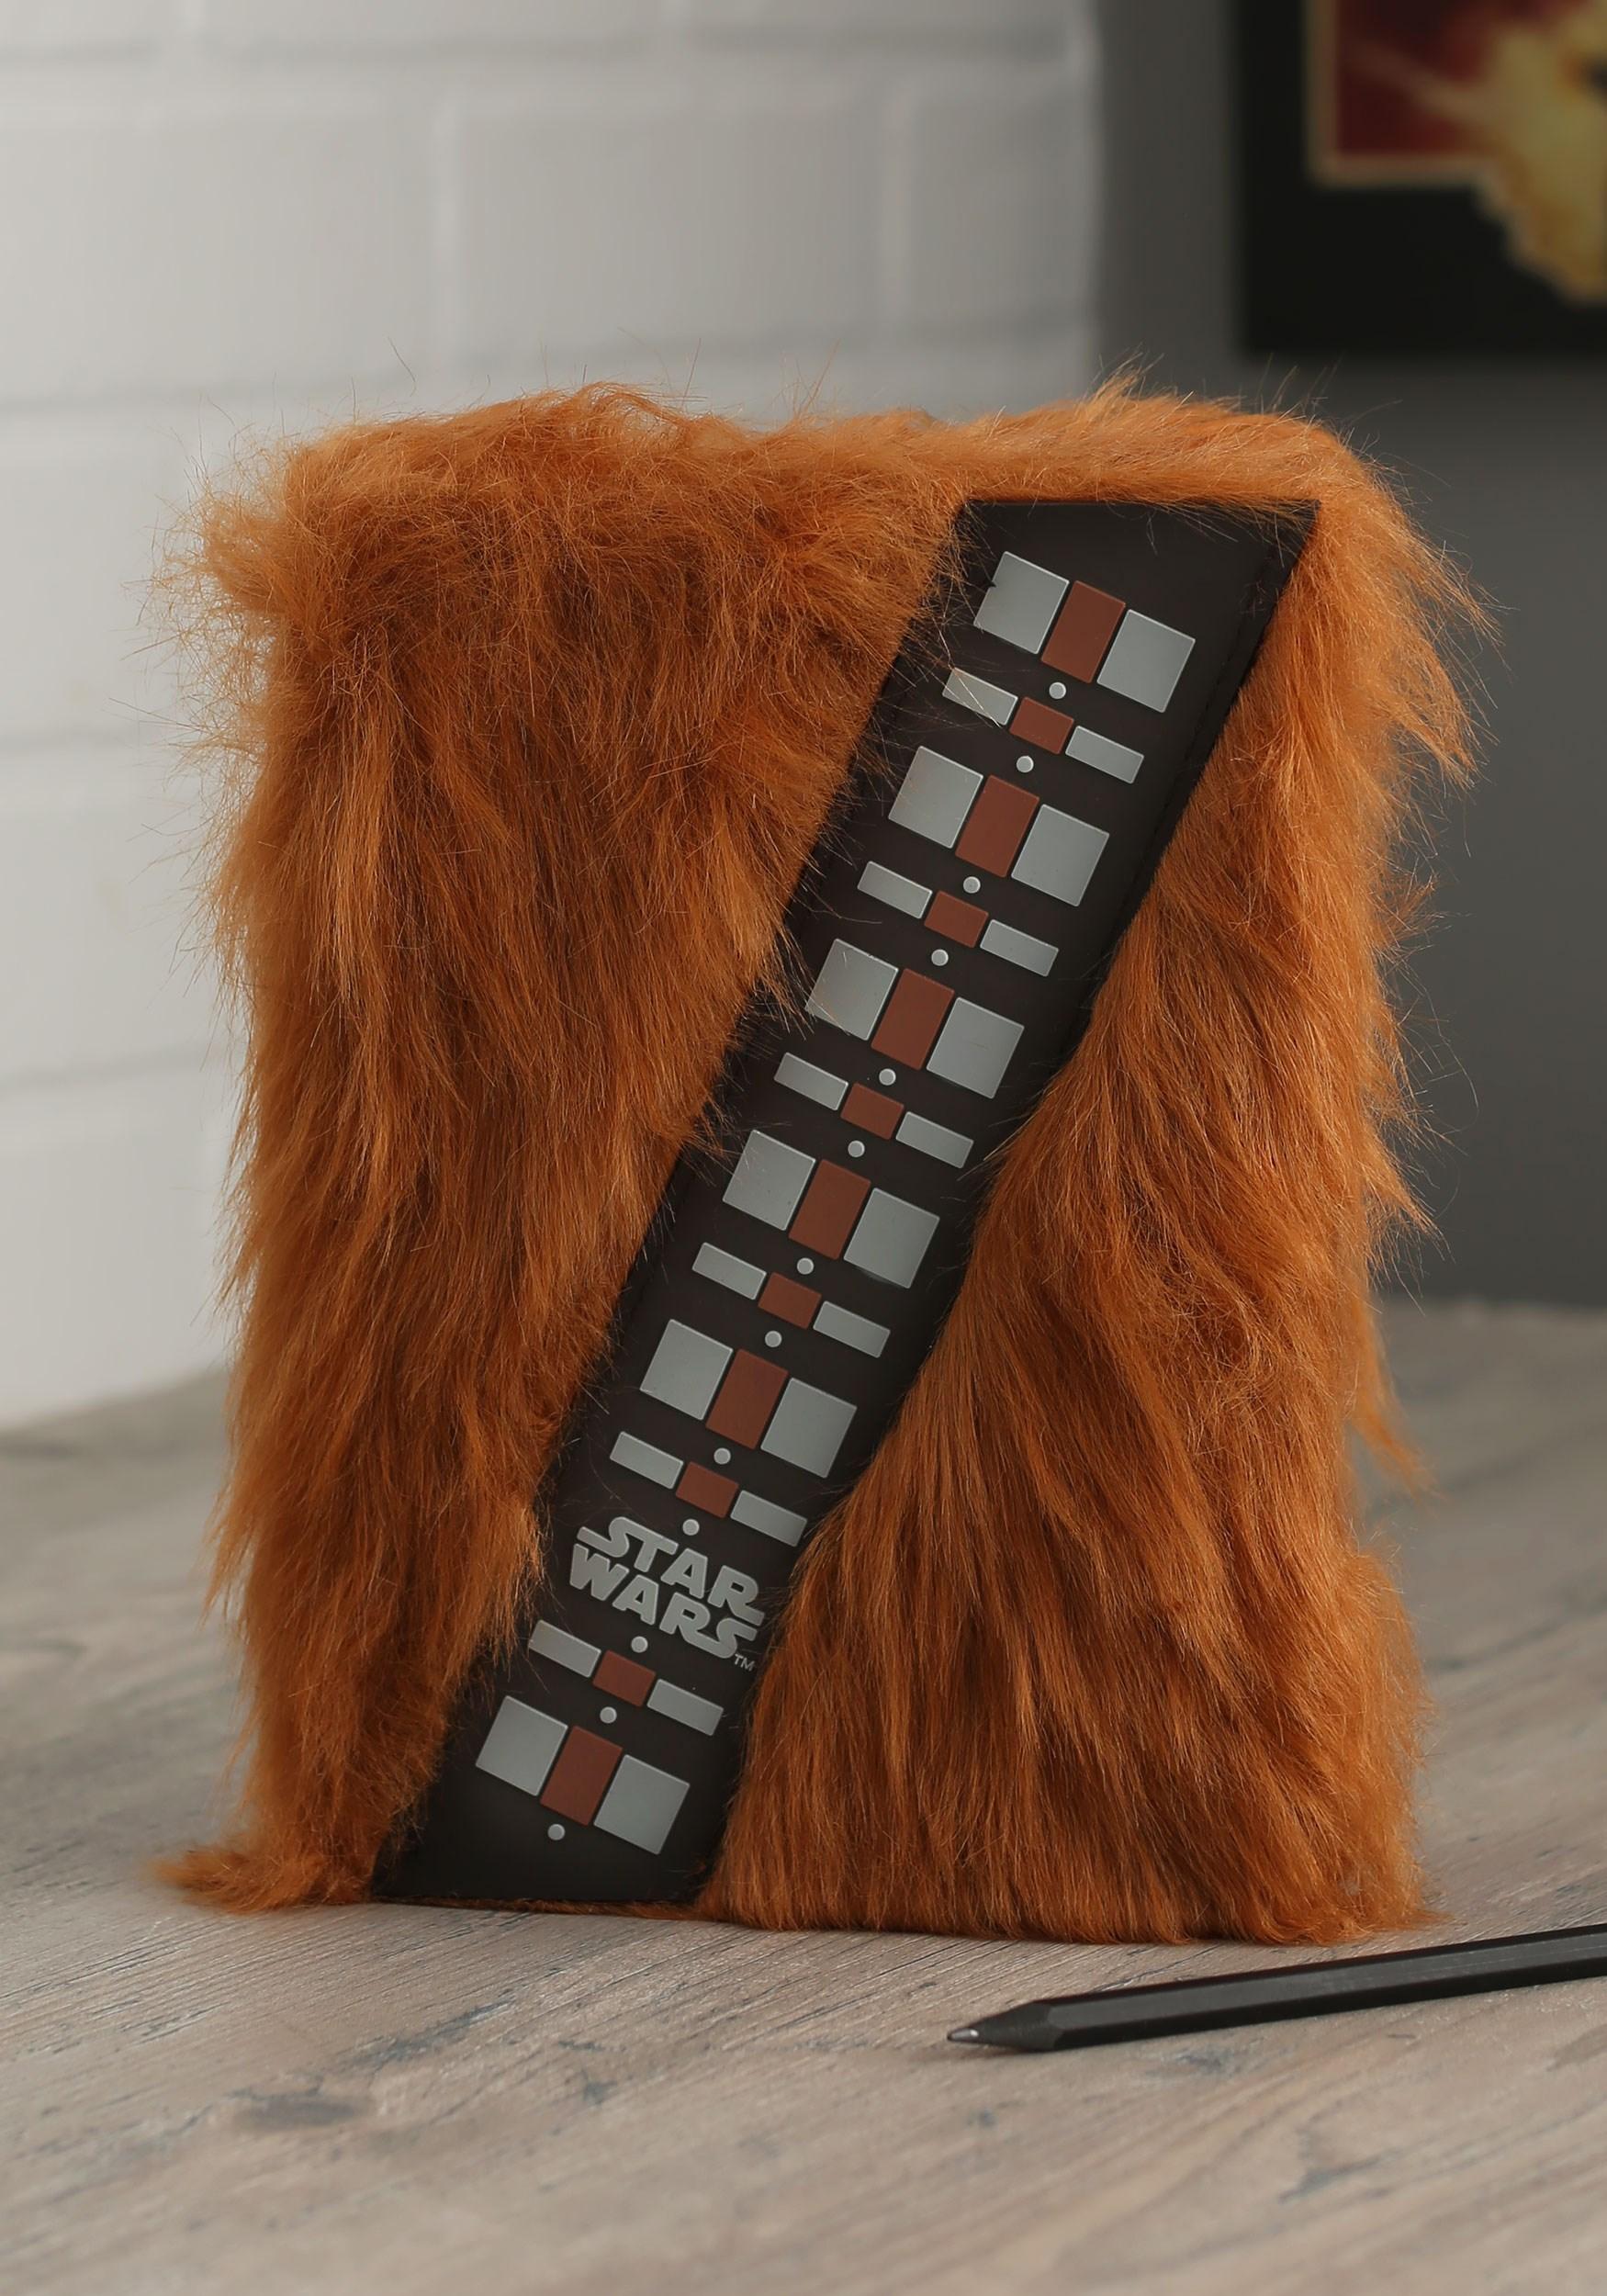 Chewbacca Star Wars Deluxe Journal